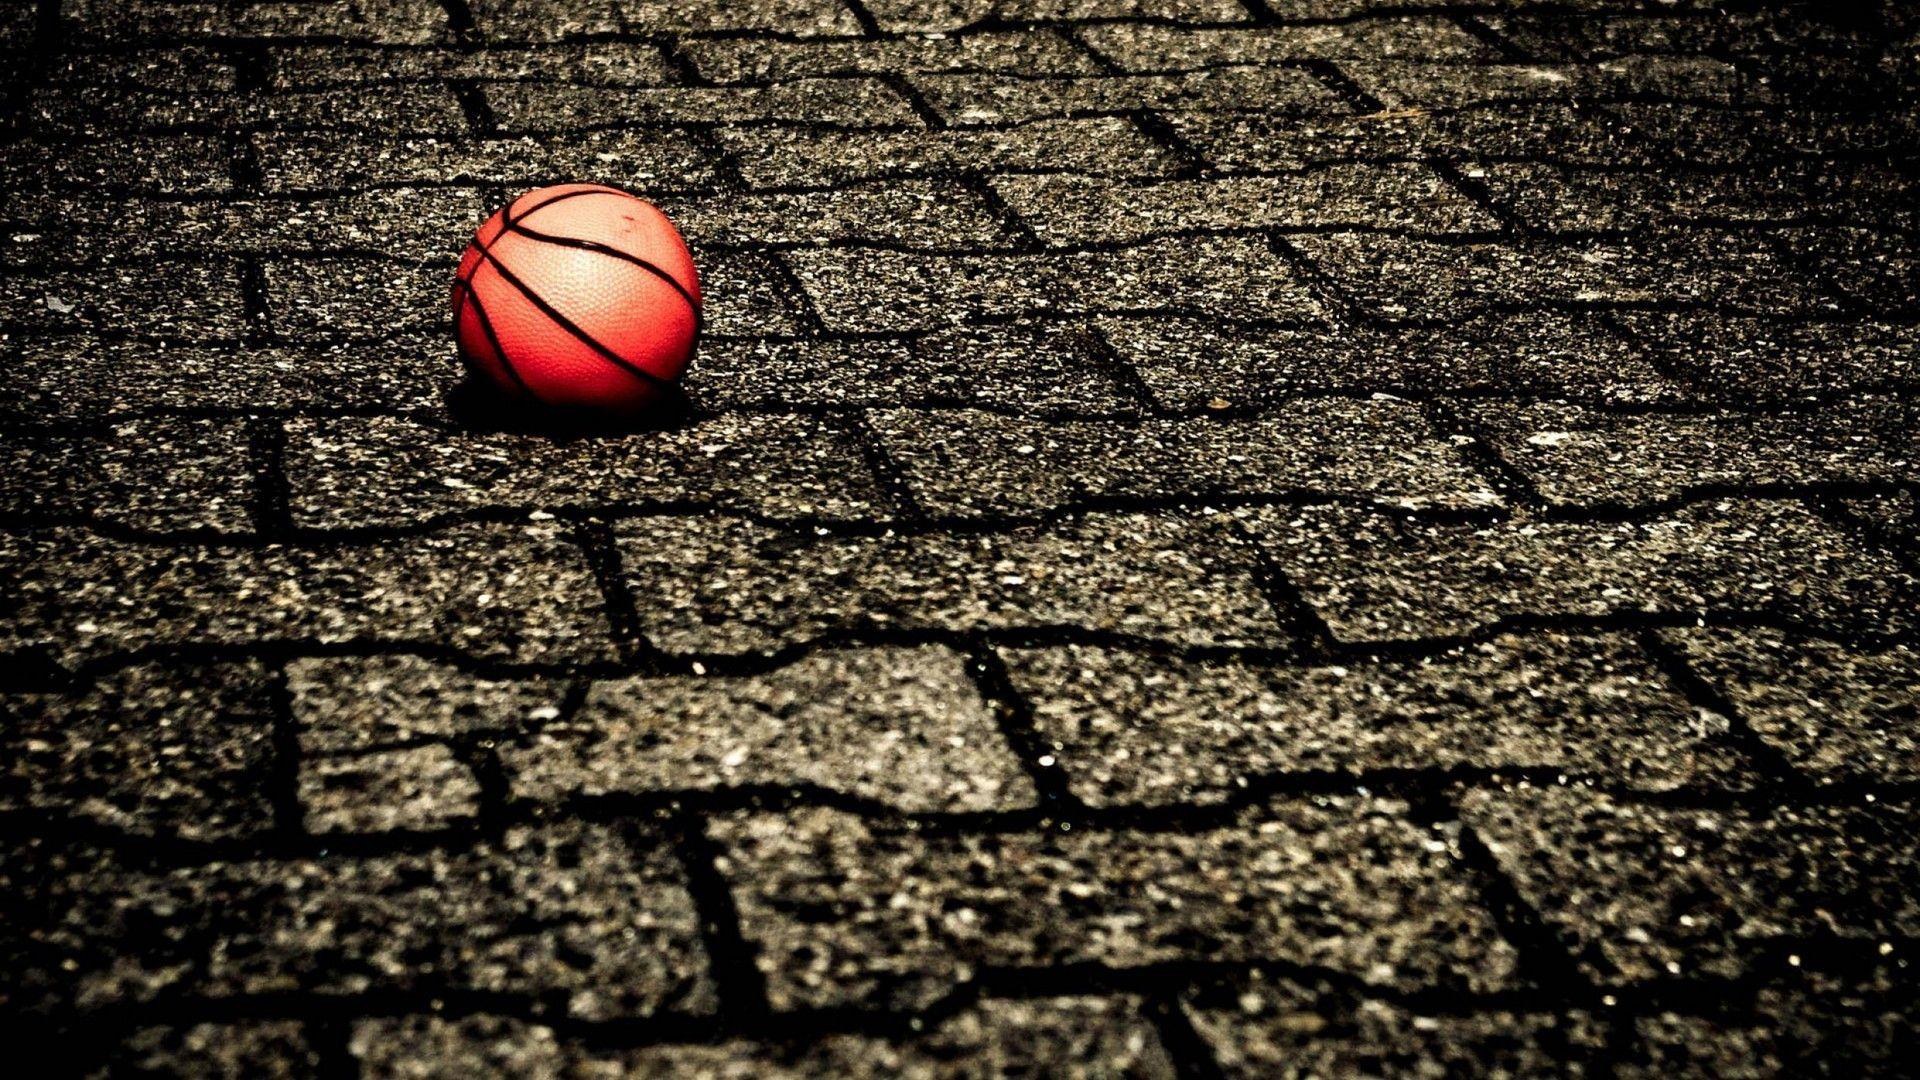 Basketball Wallpaper For Mac Backgrounds 2021 Basketball Wallpaper Basketball Wallpapers Hd Street Basketball Basketball Background